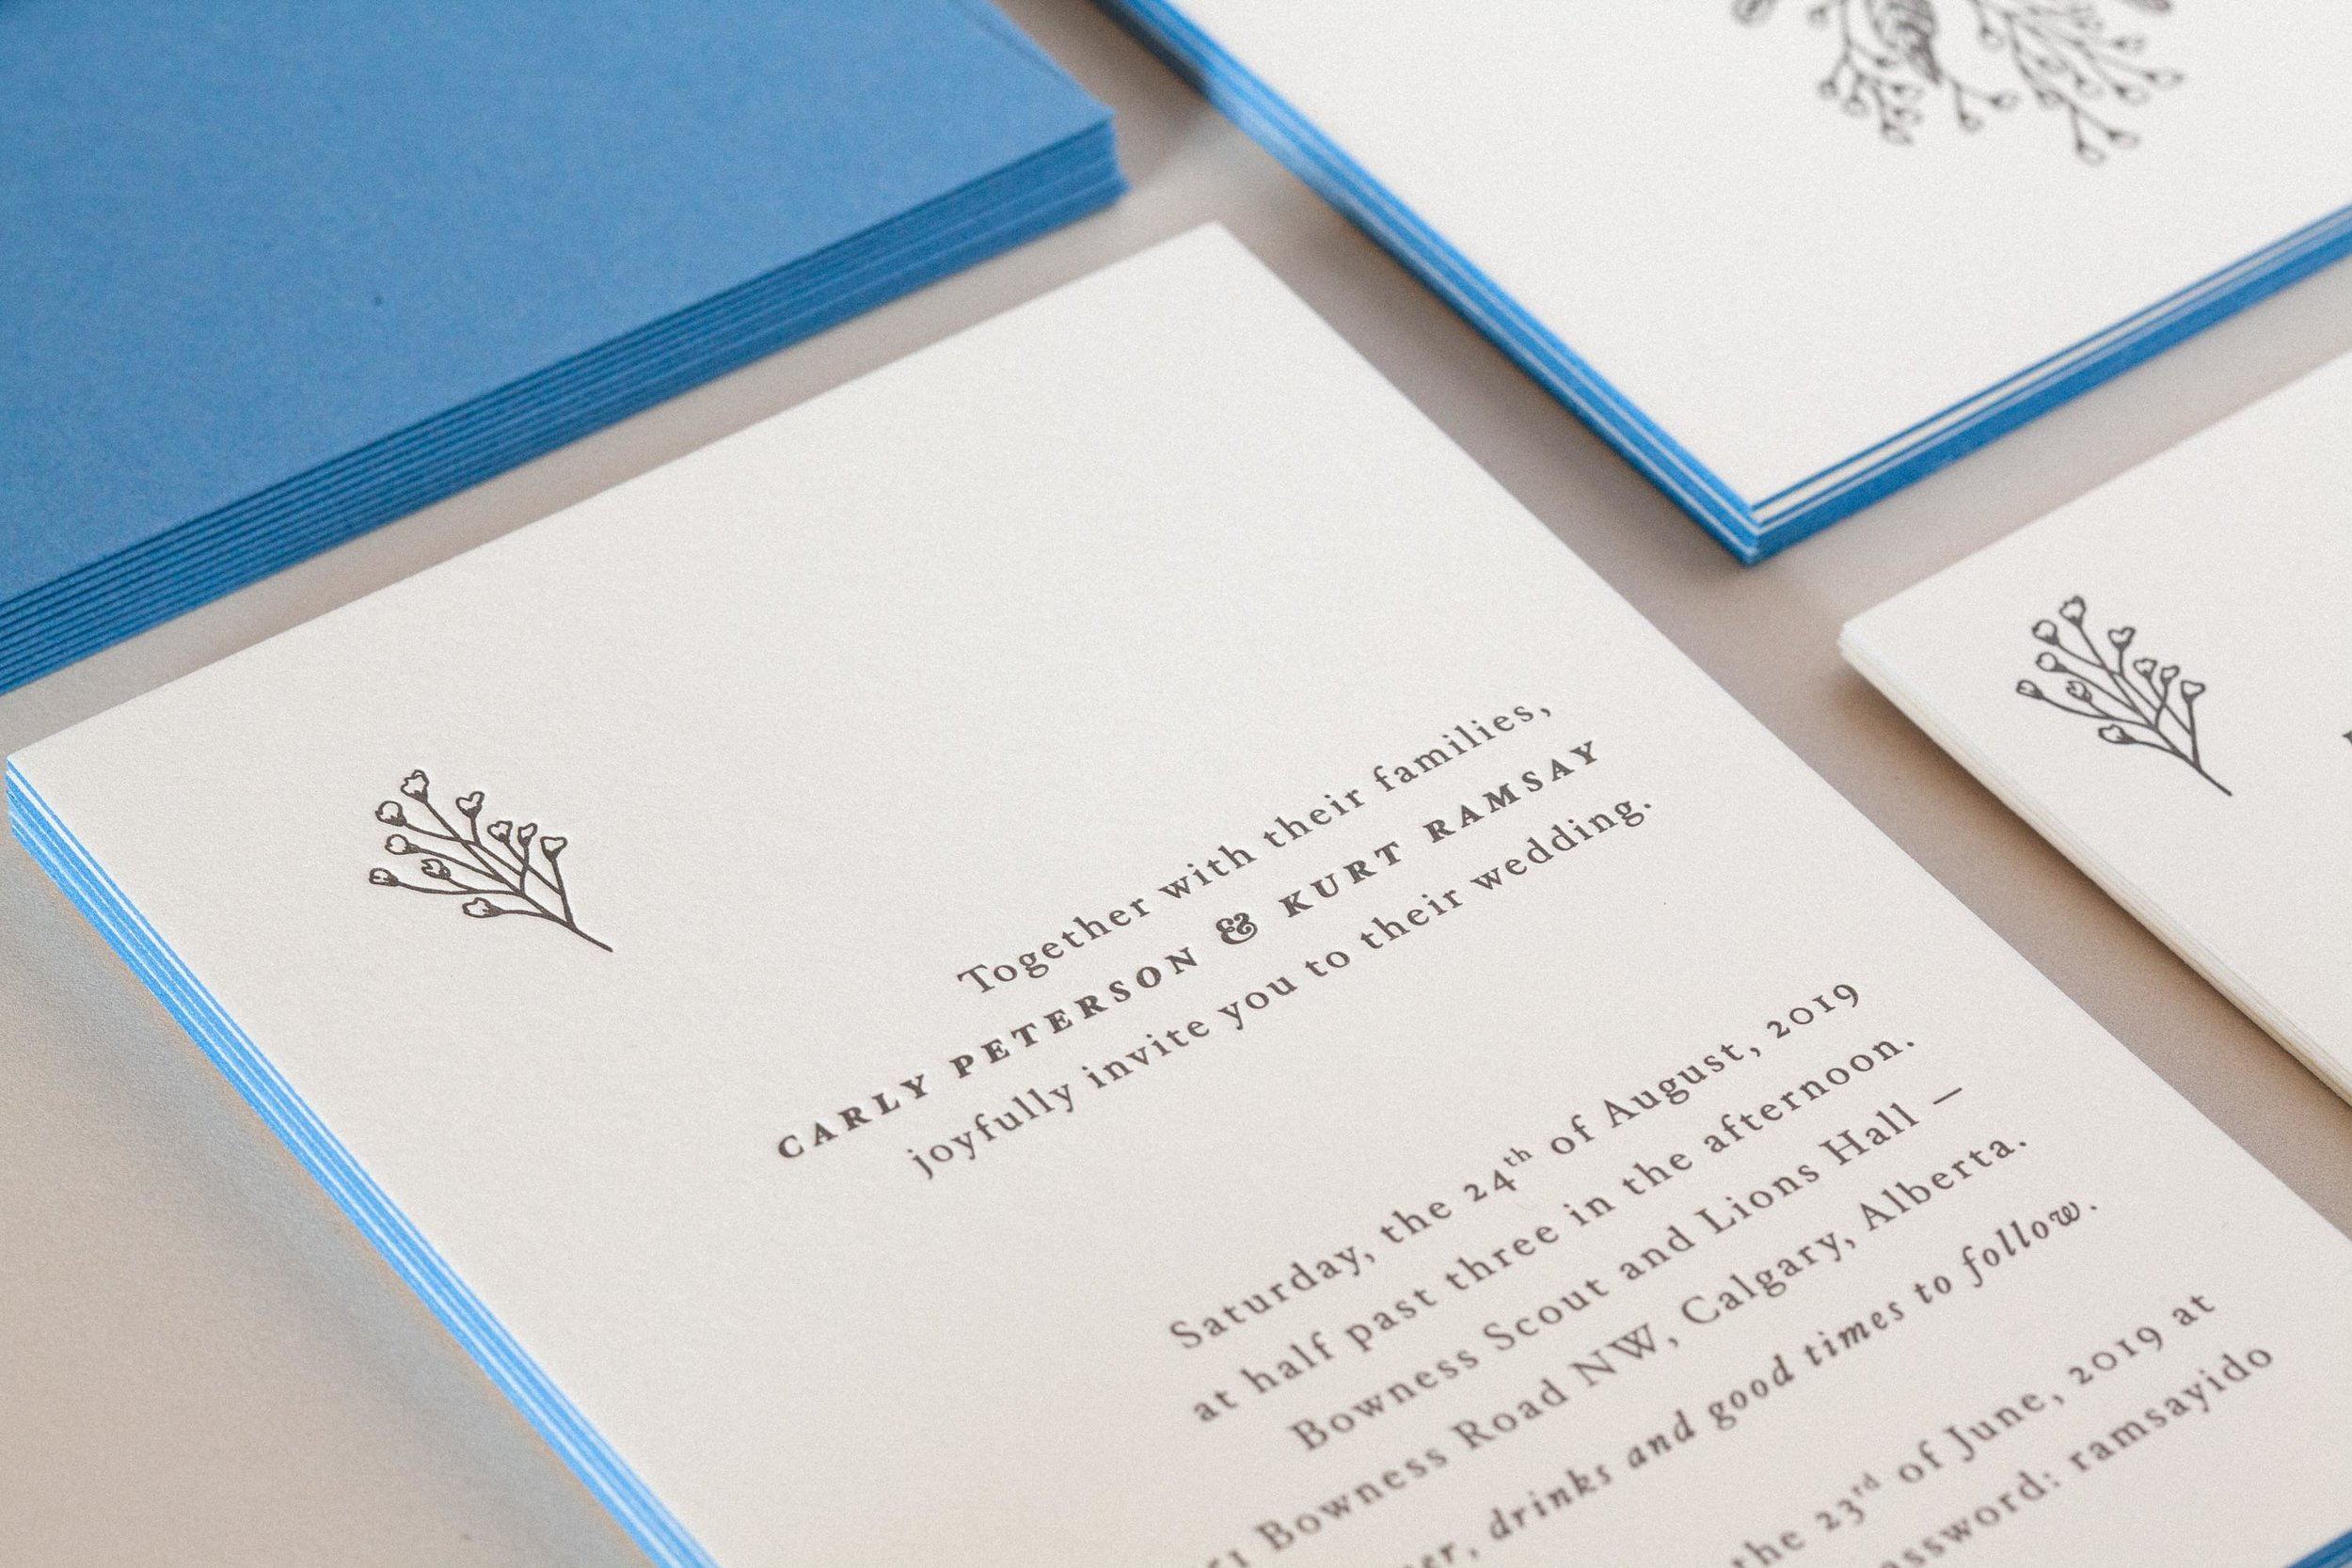 Carly & Kurt Letterpress wedding invitations